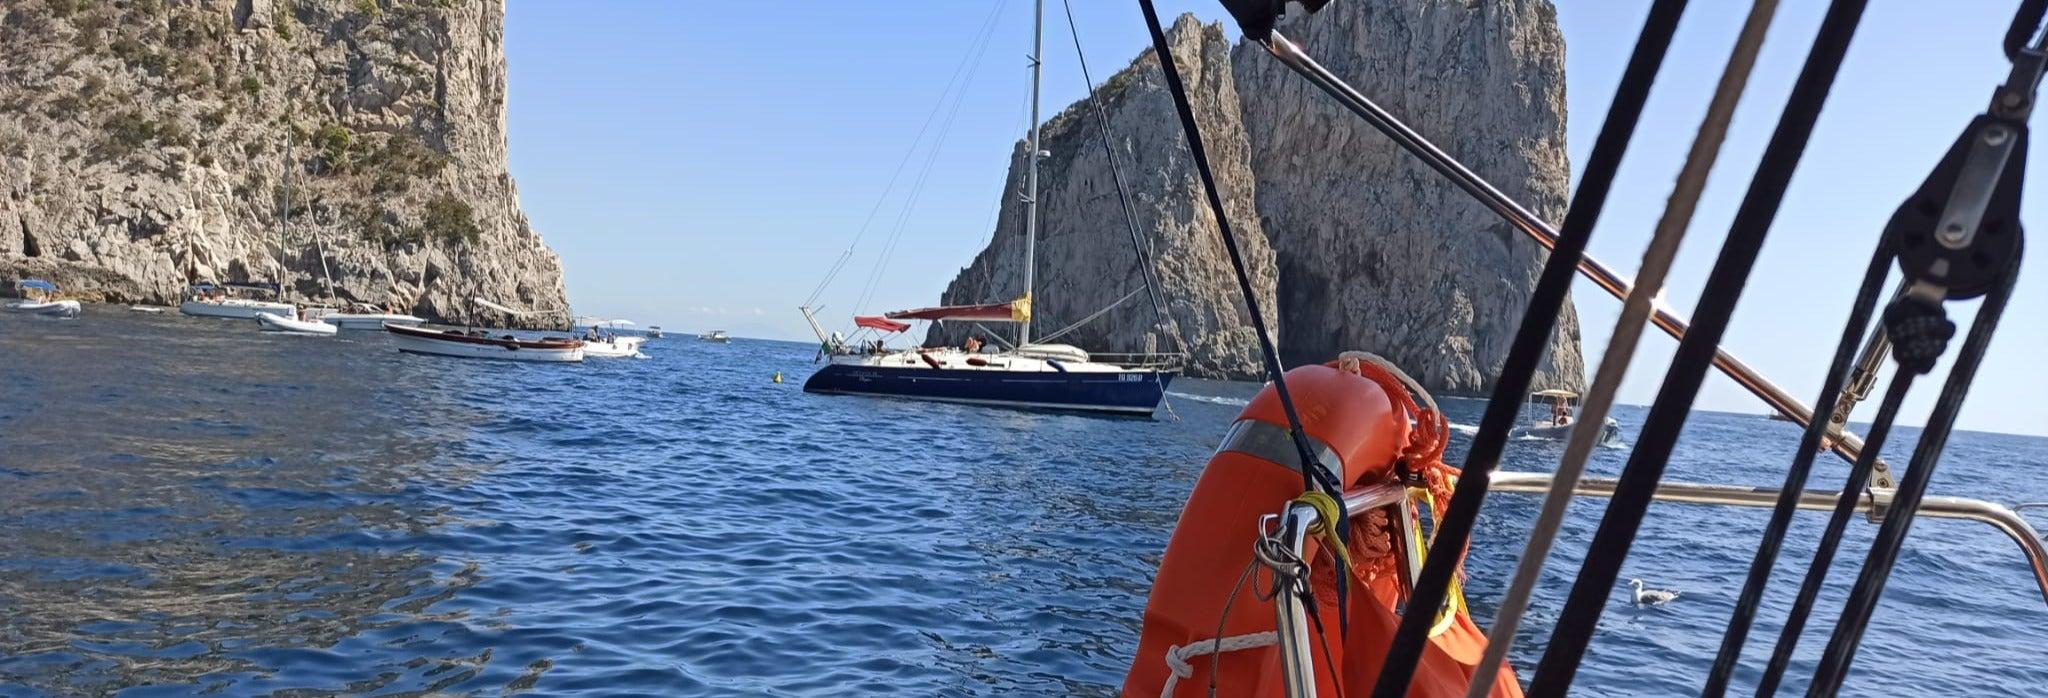 Paseo en velero por la península de Sorrento